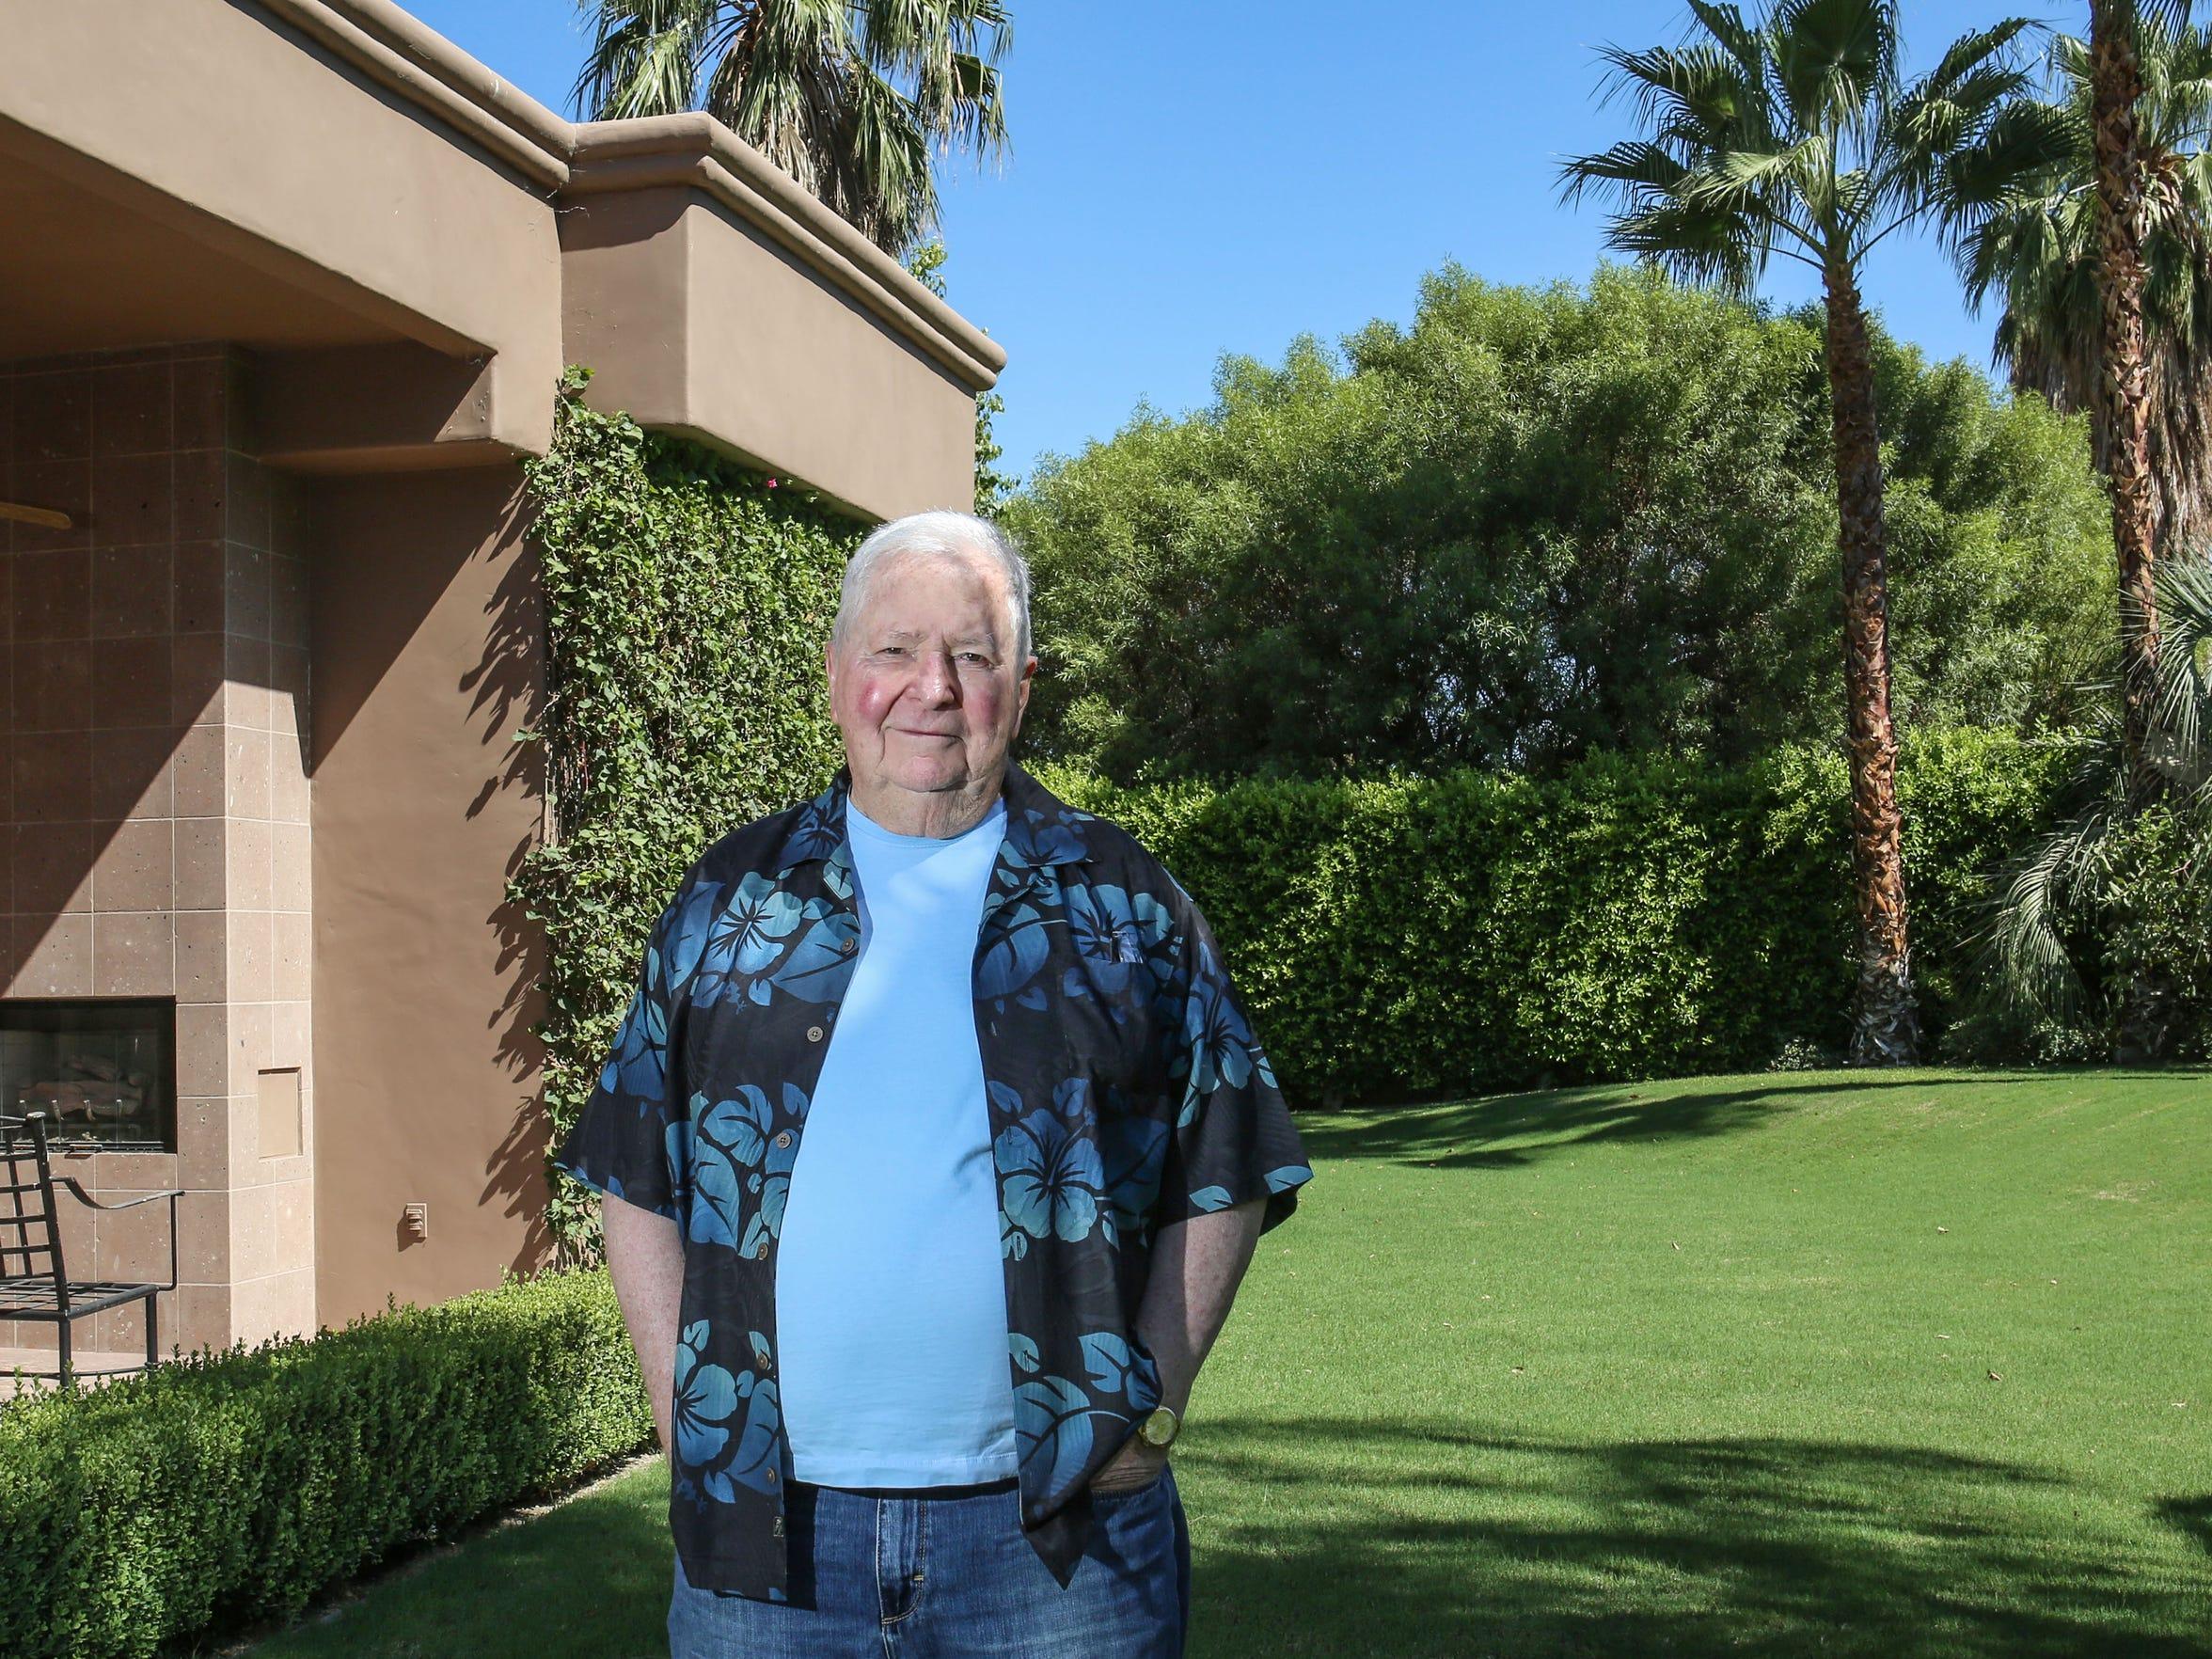 Tom Reiser lives in the Bella Monte neighborhood in